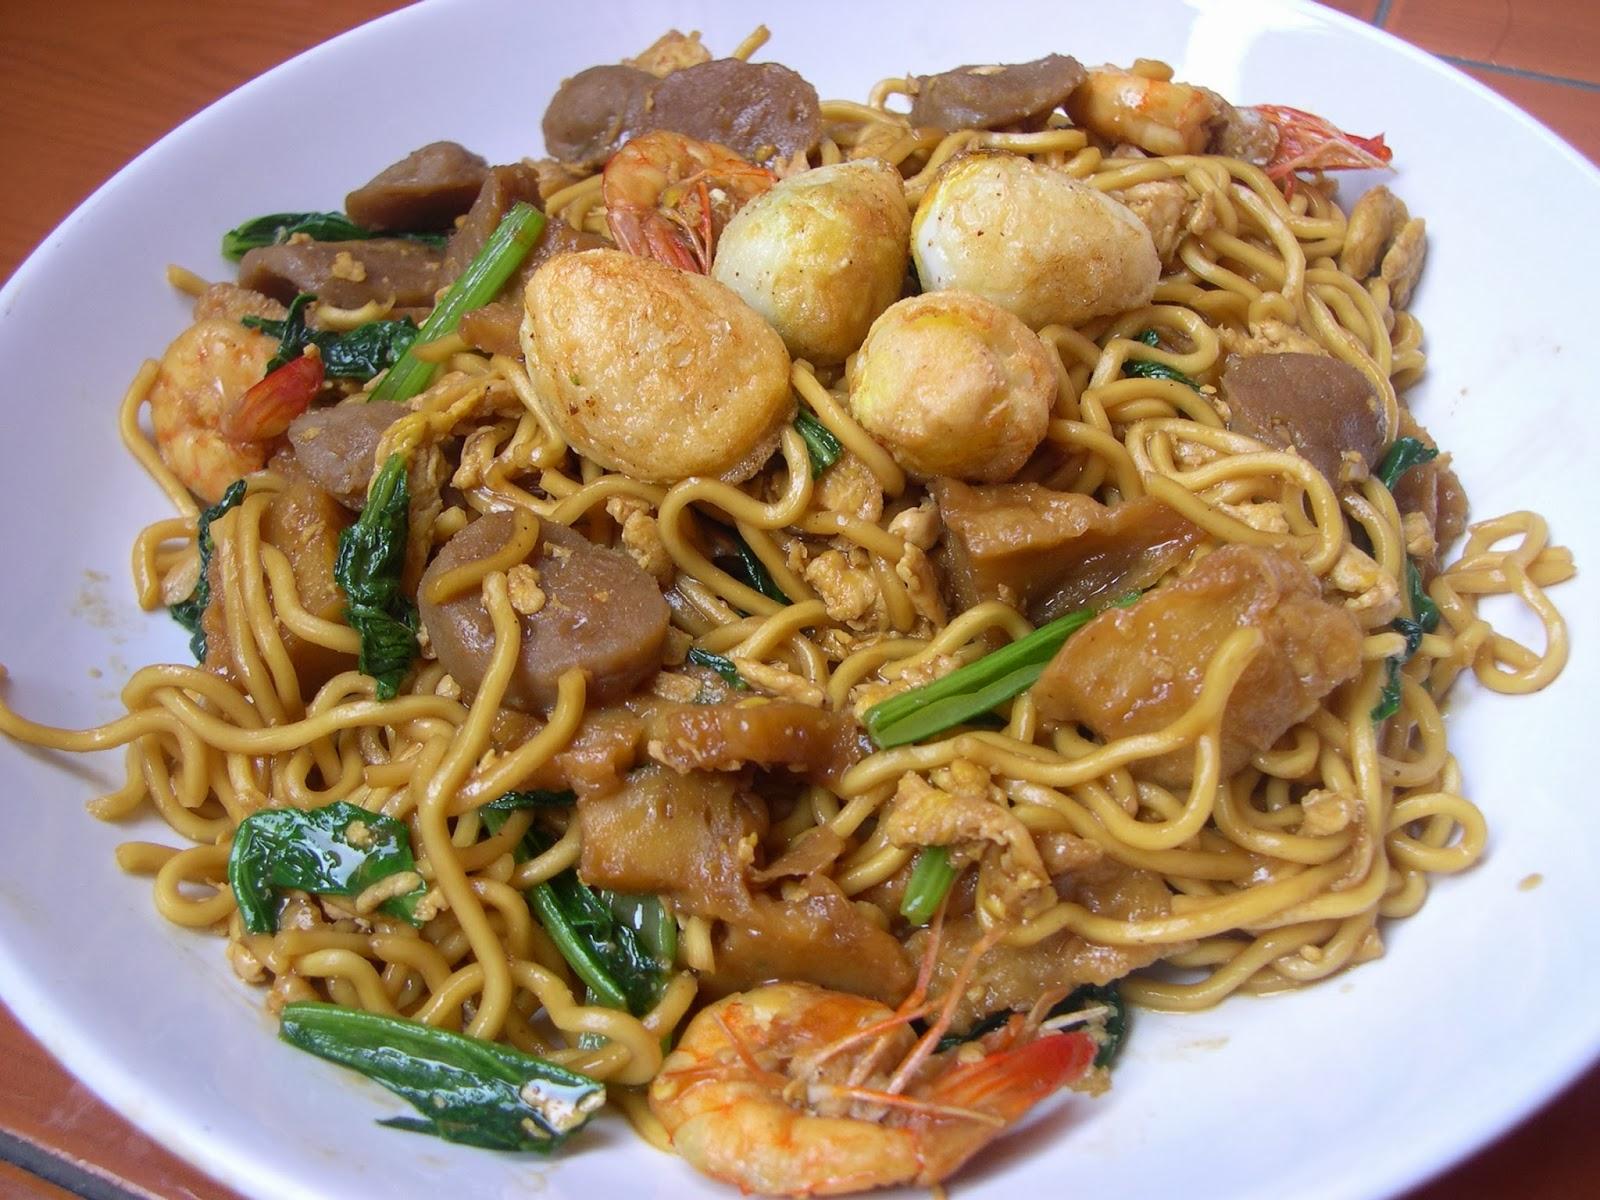 Resep Mie Goreng Jawa Sederhana Alternatif Makanan Selain